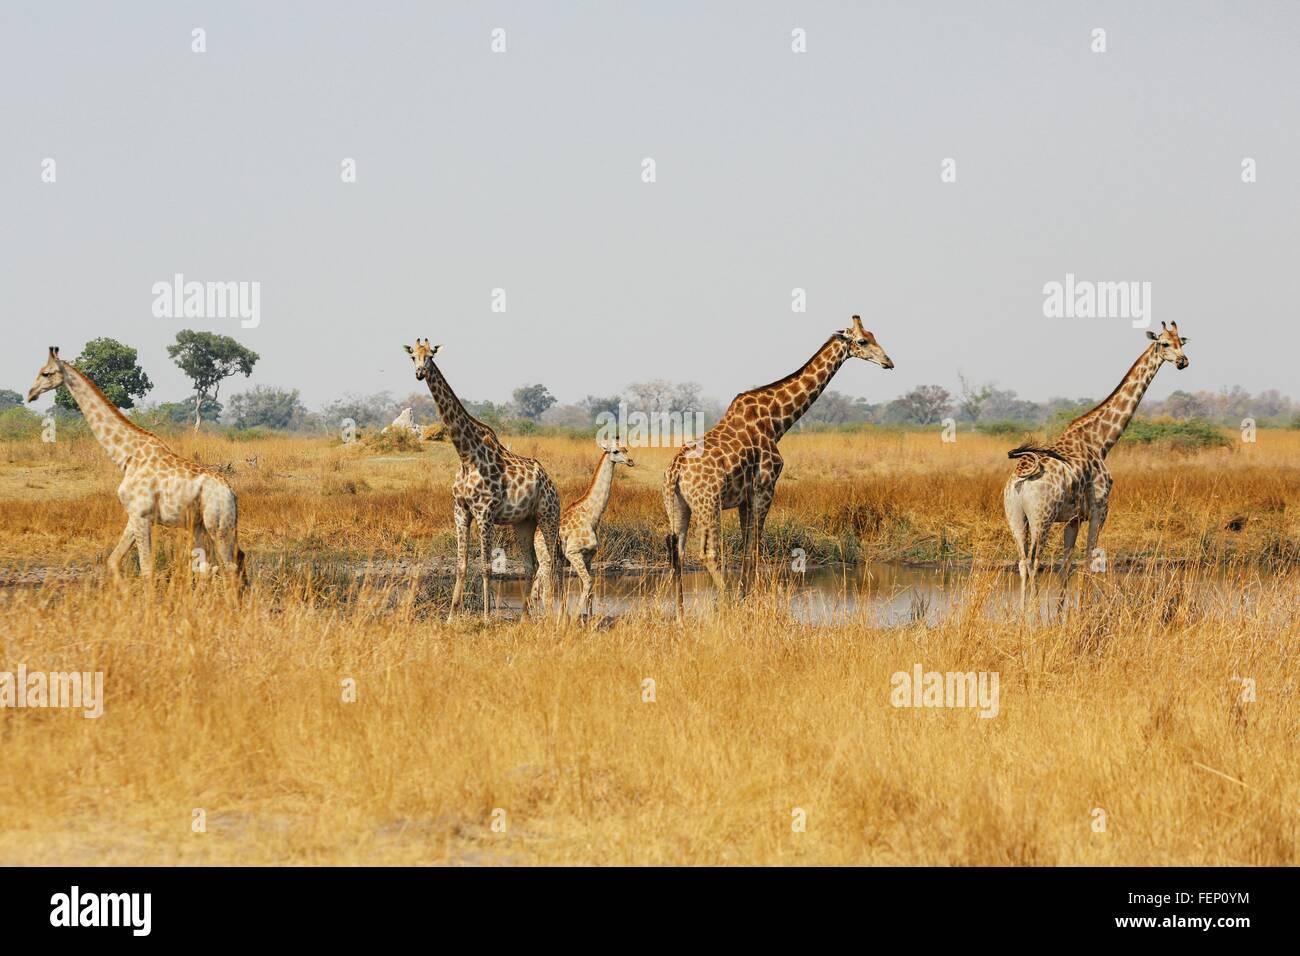 Torre di giraffe in piedi in acqua pan, Botswana Immagini Stock